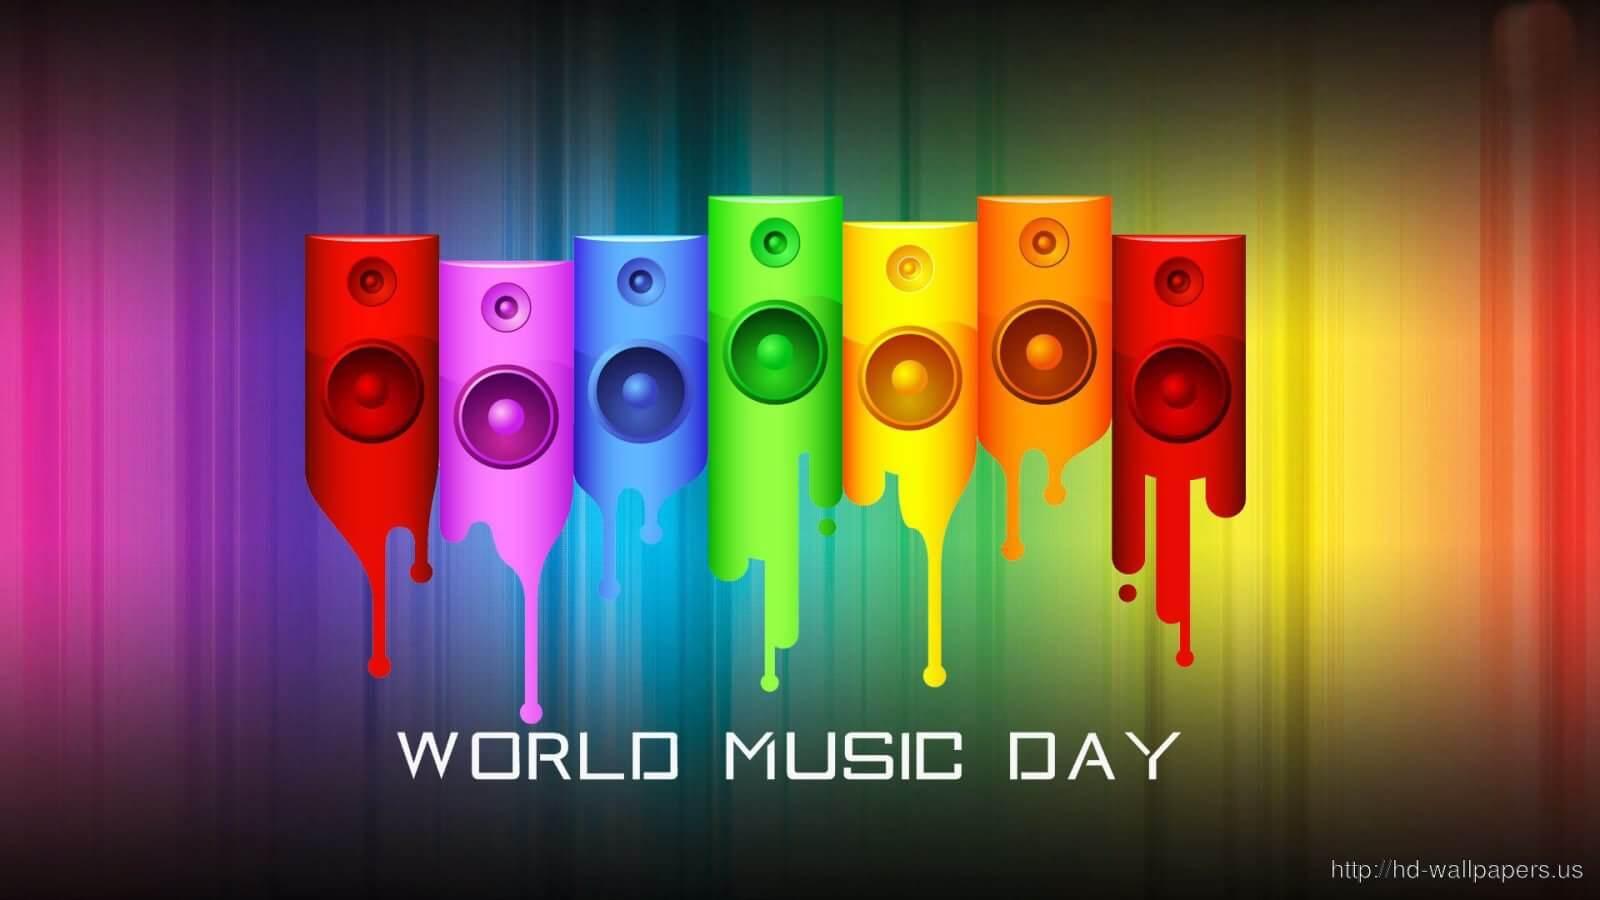 World Music Day HD Wallpaper 1600x900